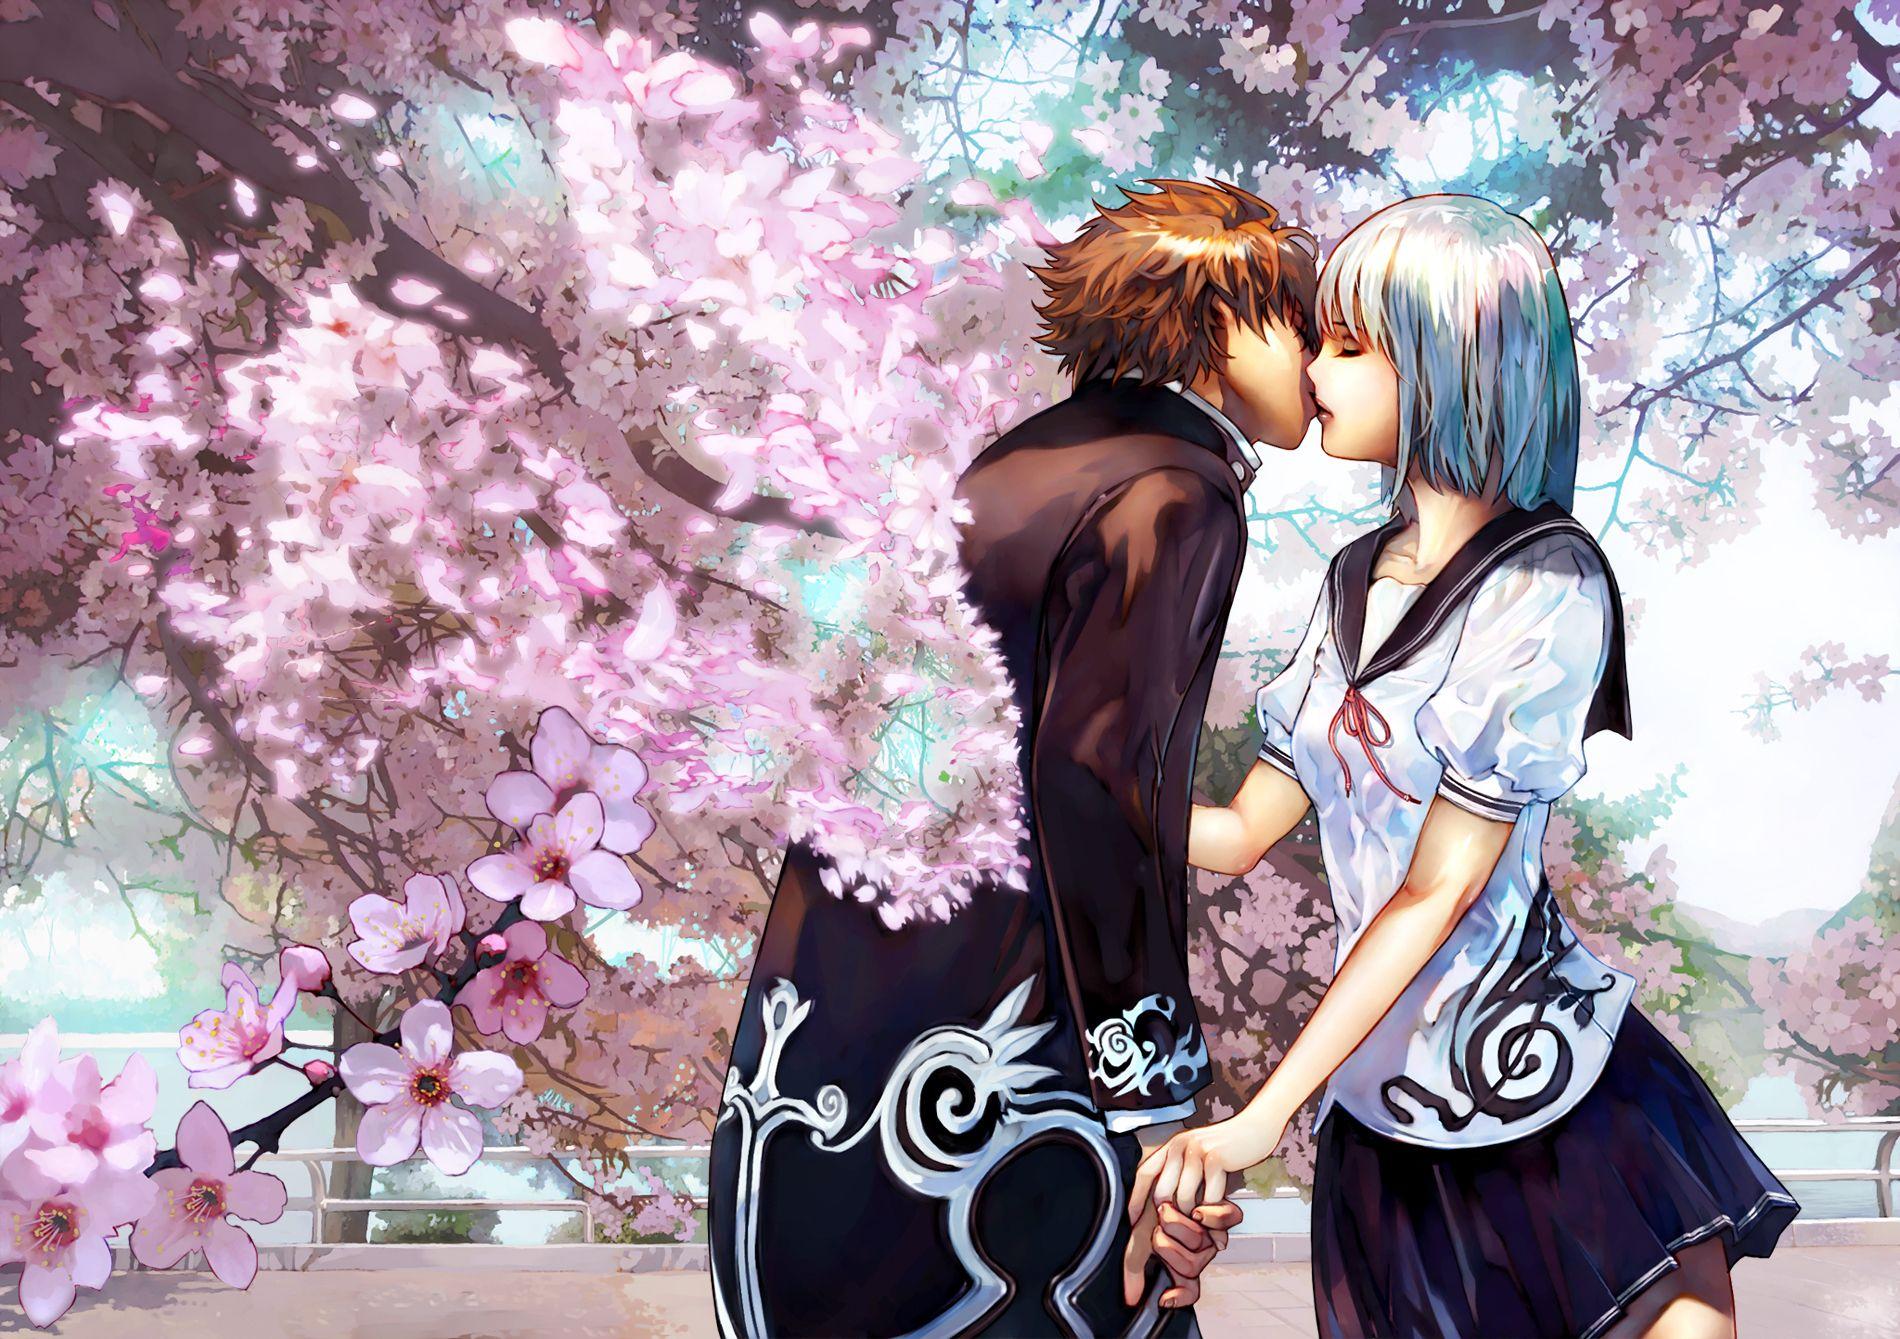 Anime Love Hd Wallpaper